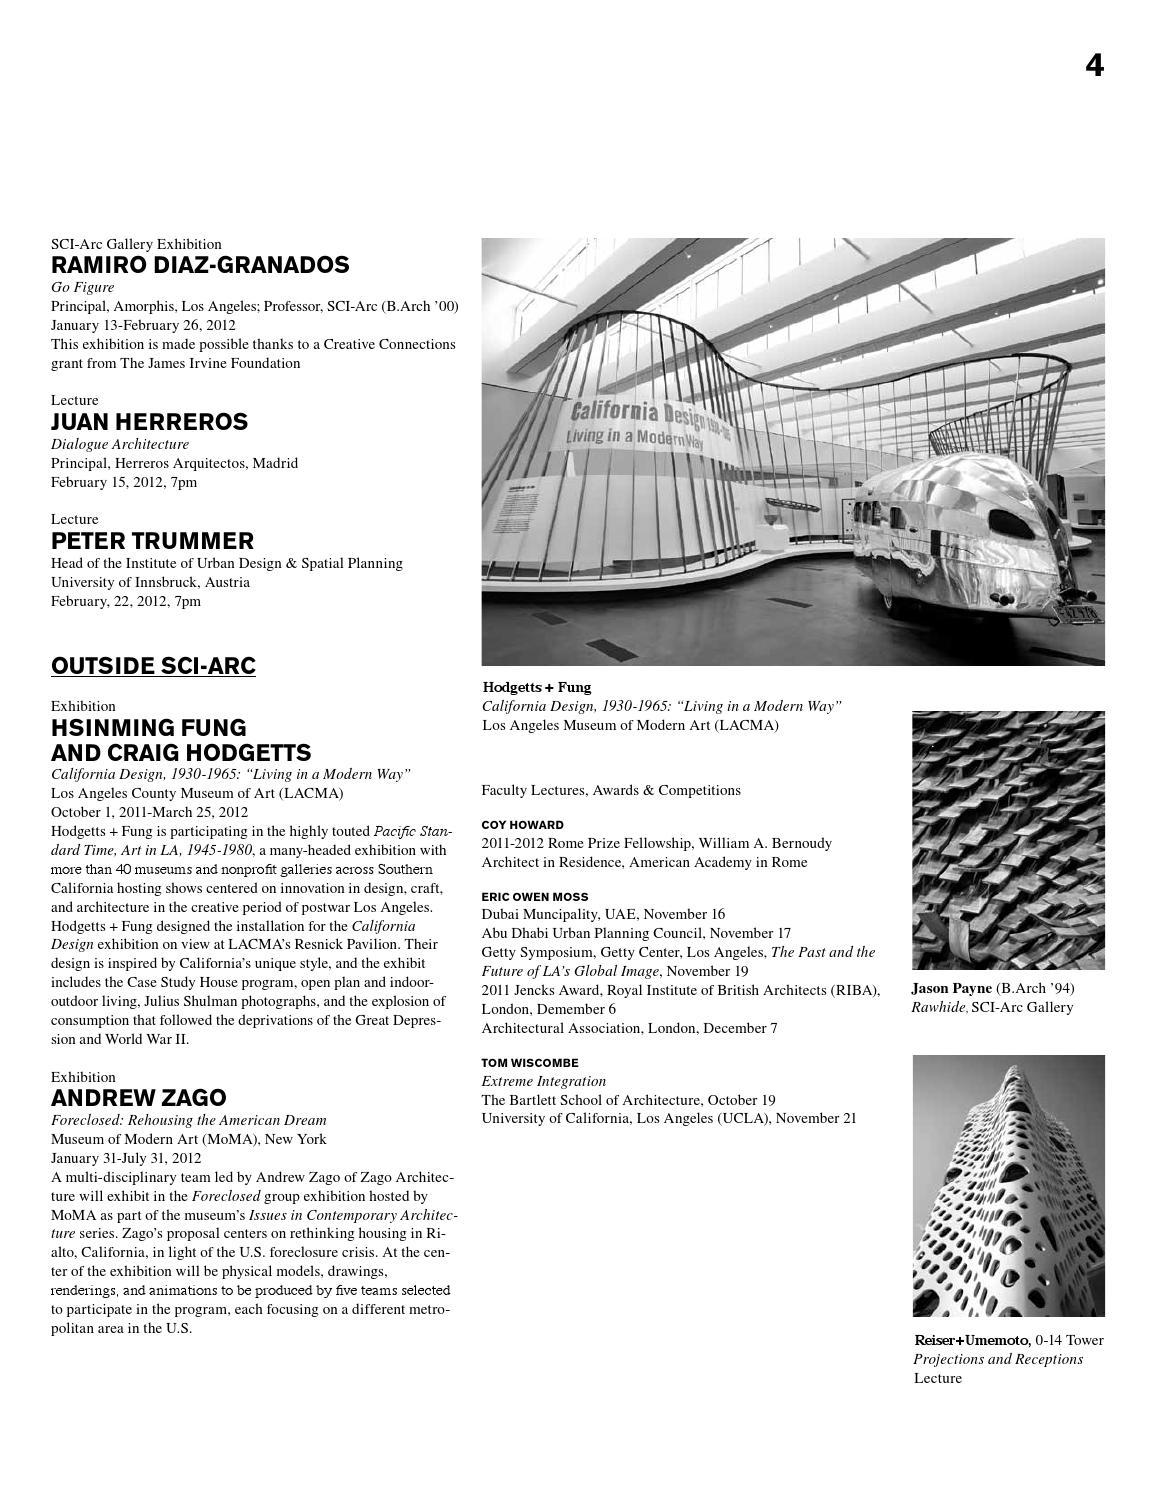 SCIArc Magazine No 3 (Fall 2011) by SCI-Arc - issuu